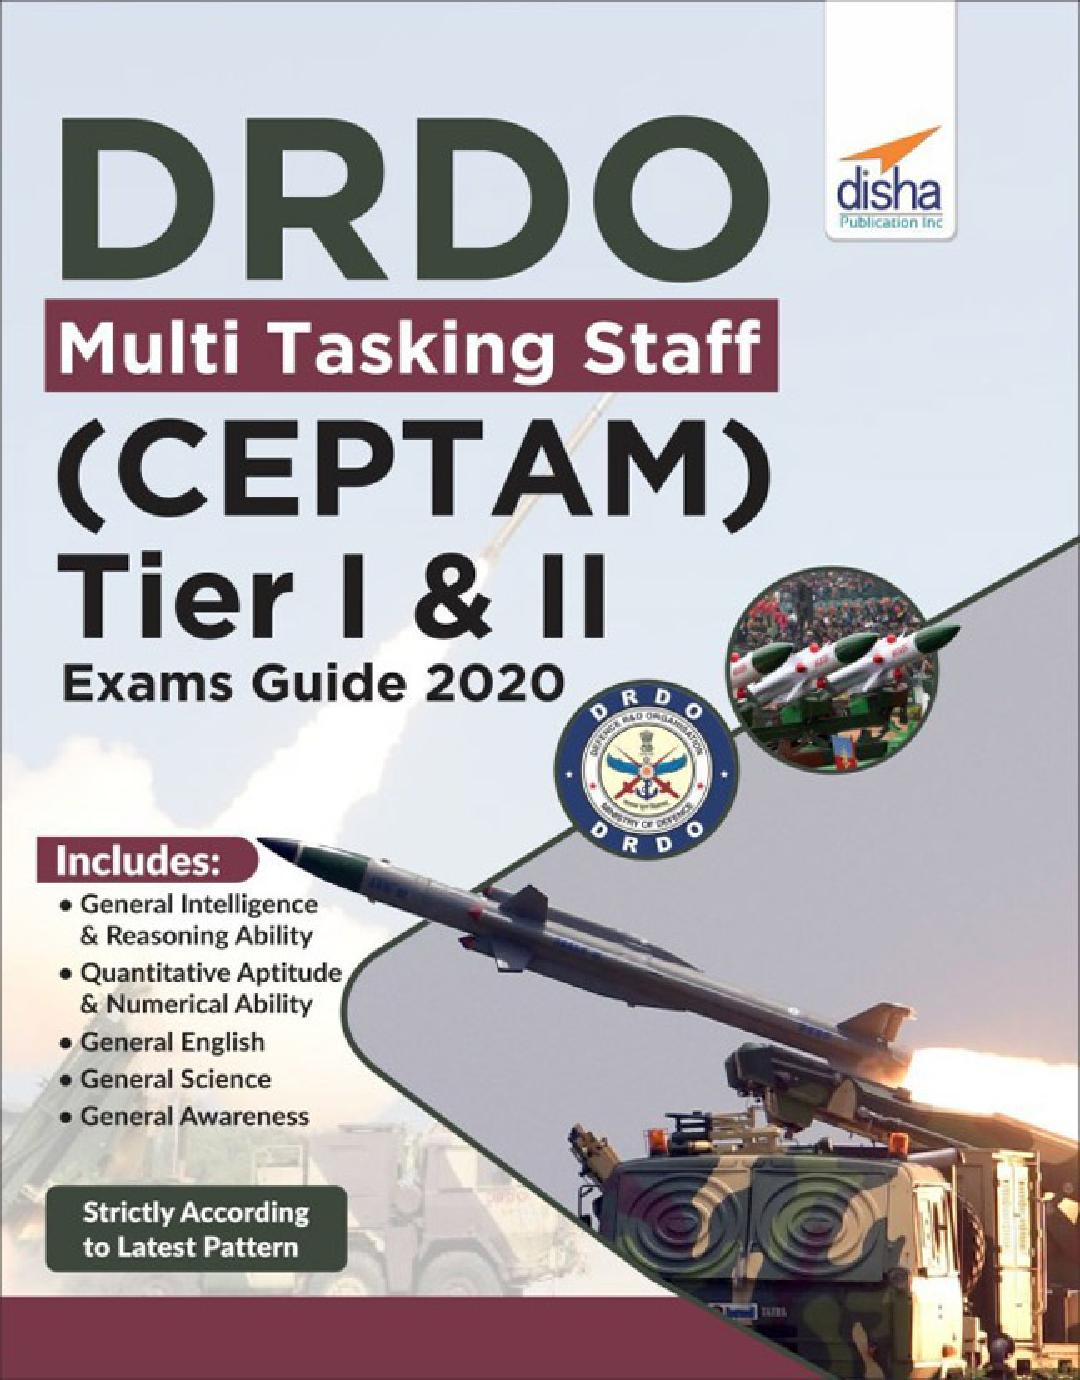 DRDO Multi Tasking Staff (CEPTAM) Tier I & II Exam Guide 2020 - Page 1